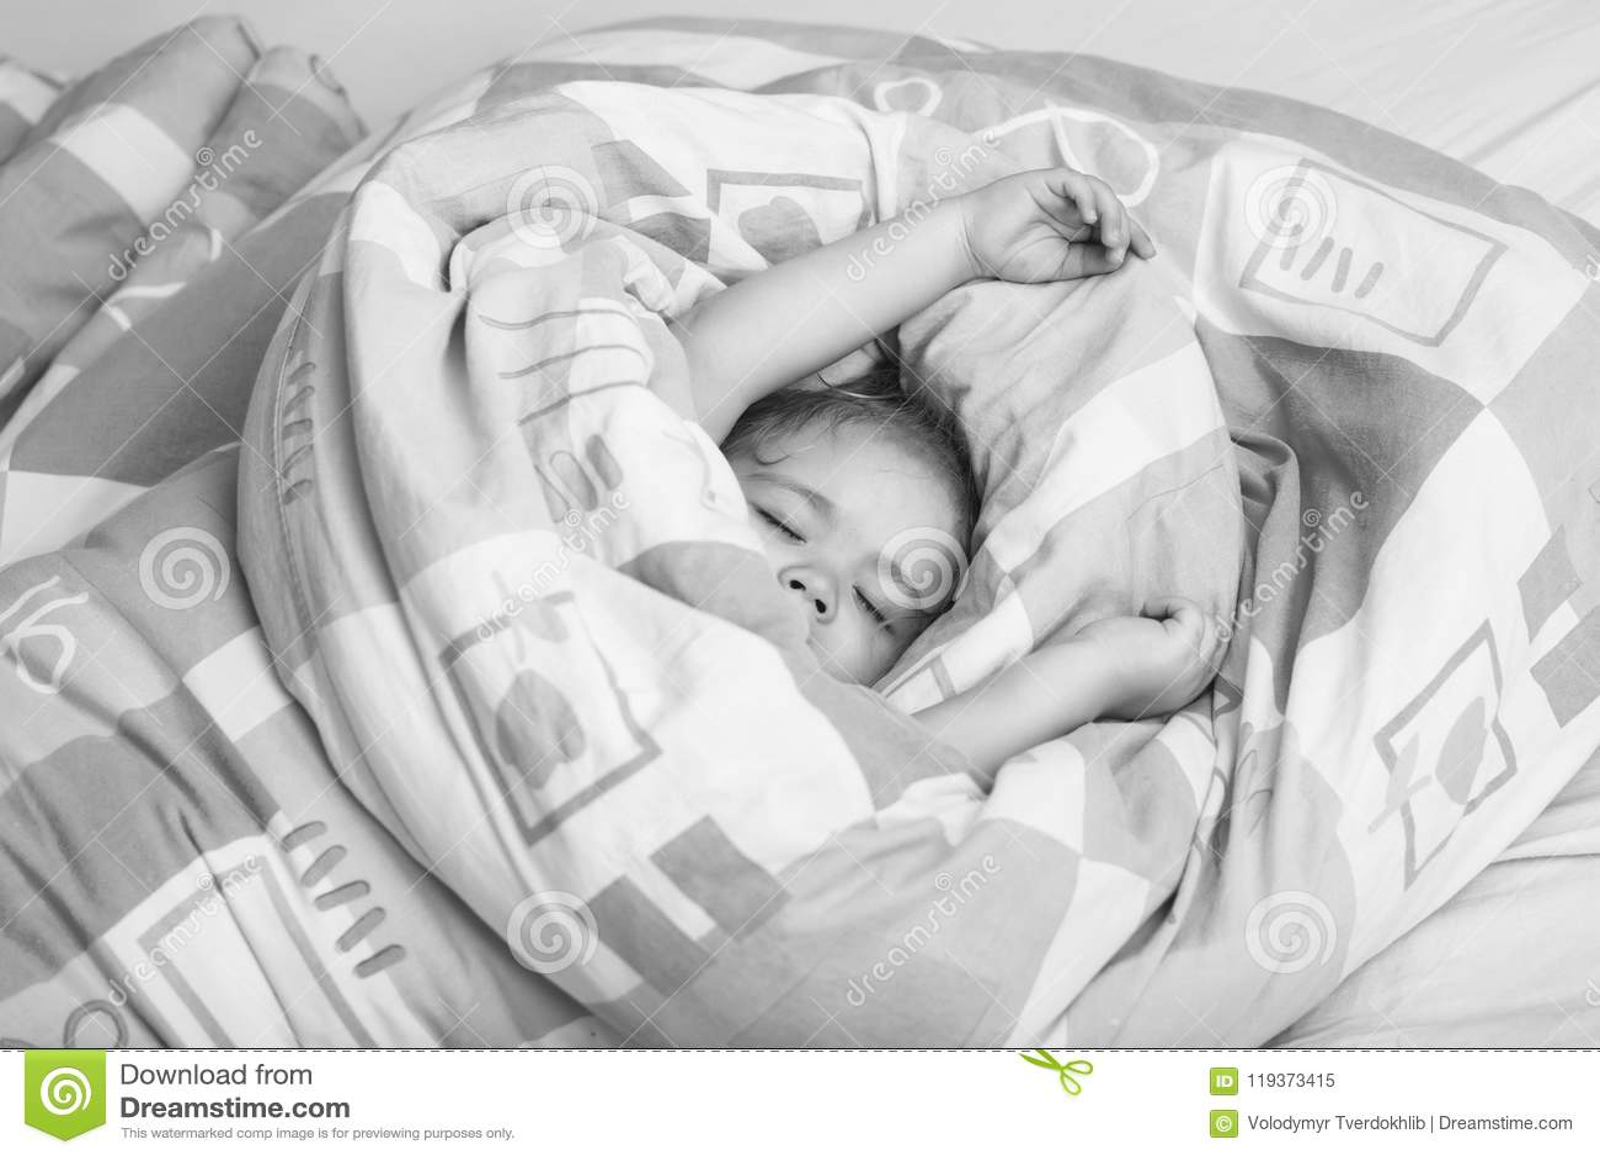 Sleeping Baby Childhood And Happiness Stock Image Image Of Little Cheerful 119373415